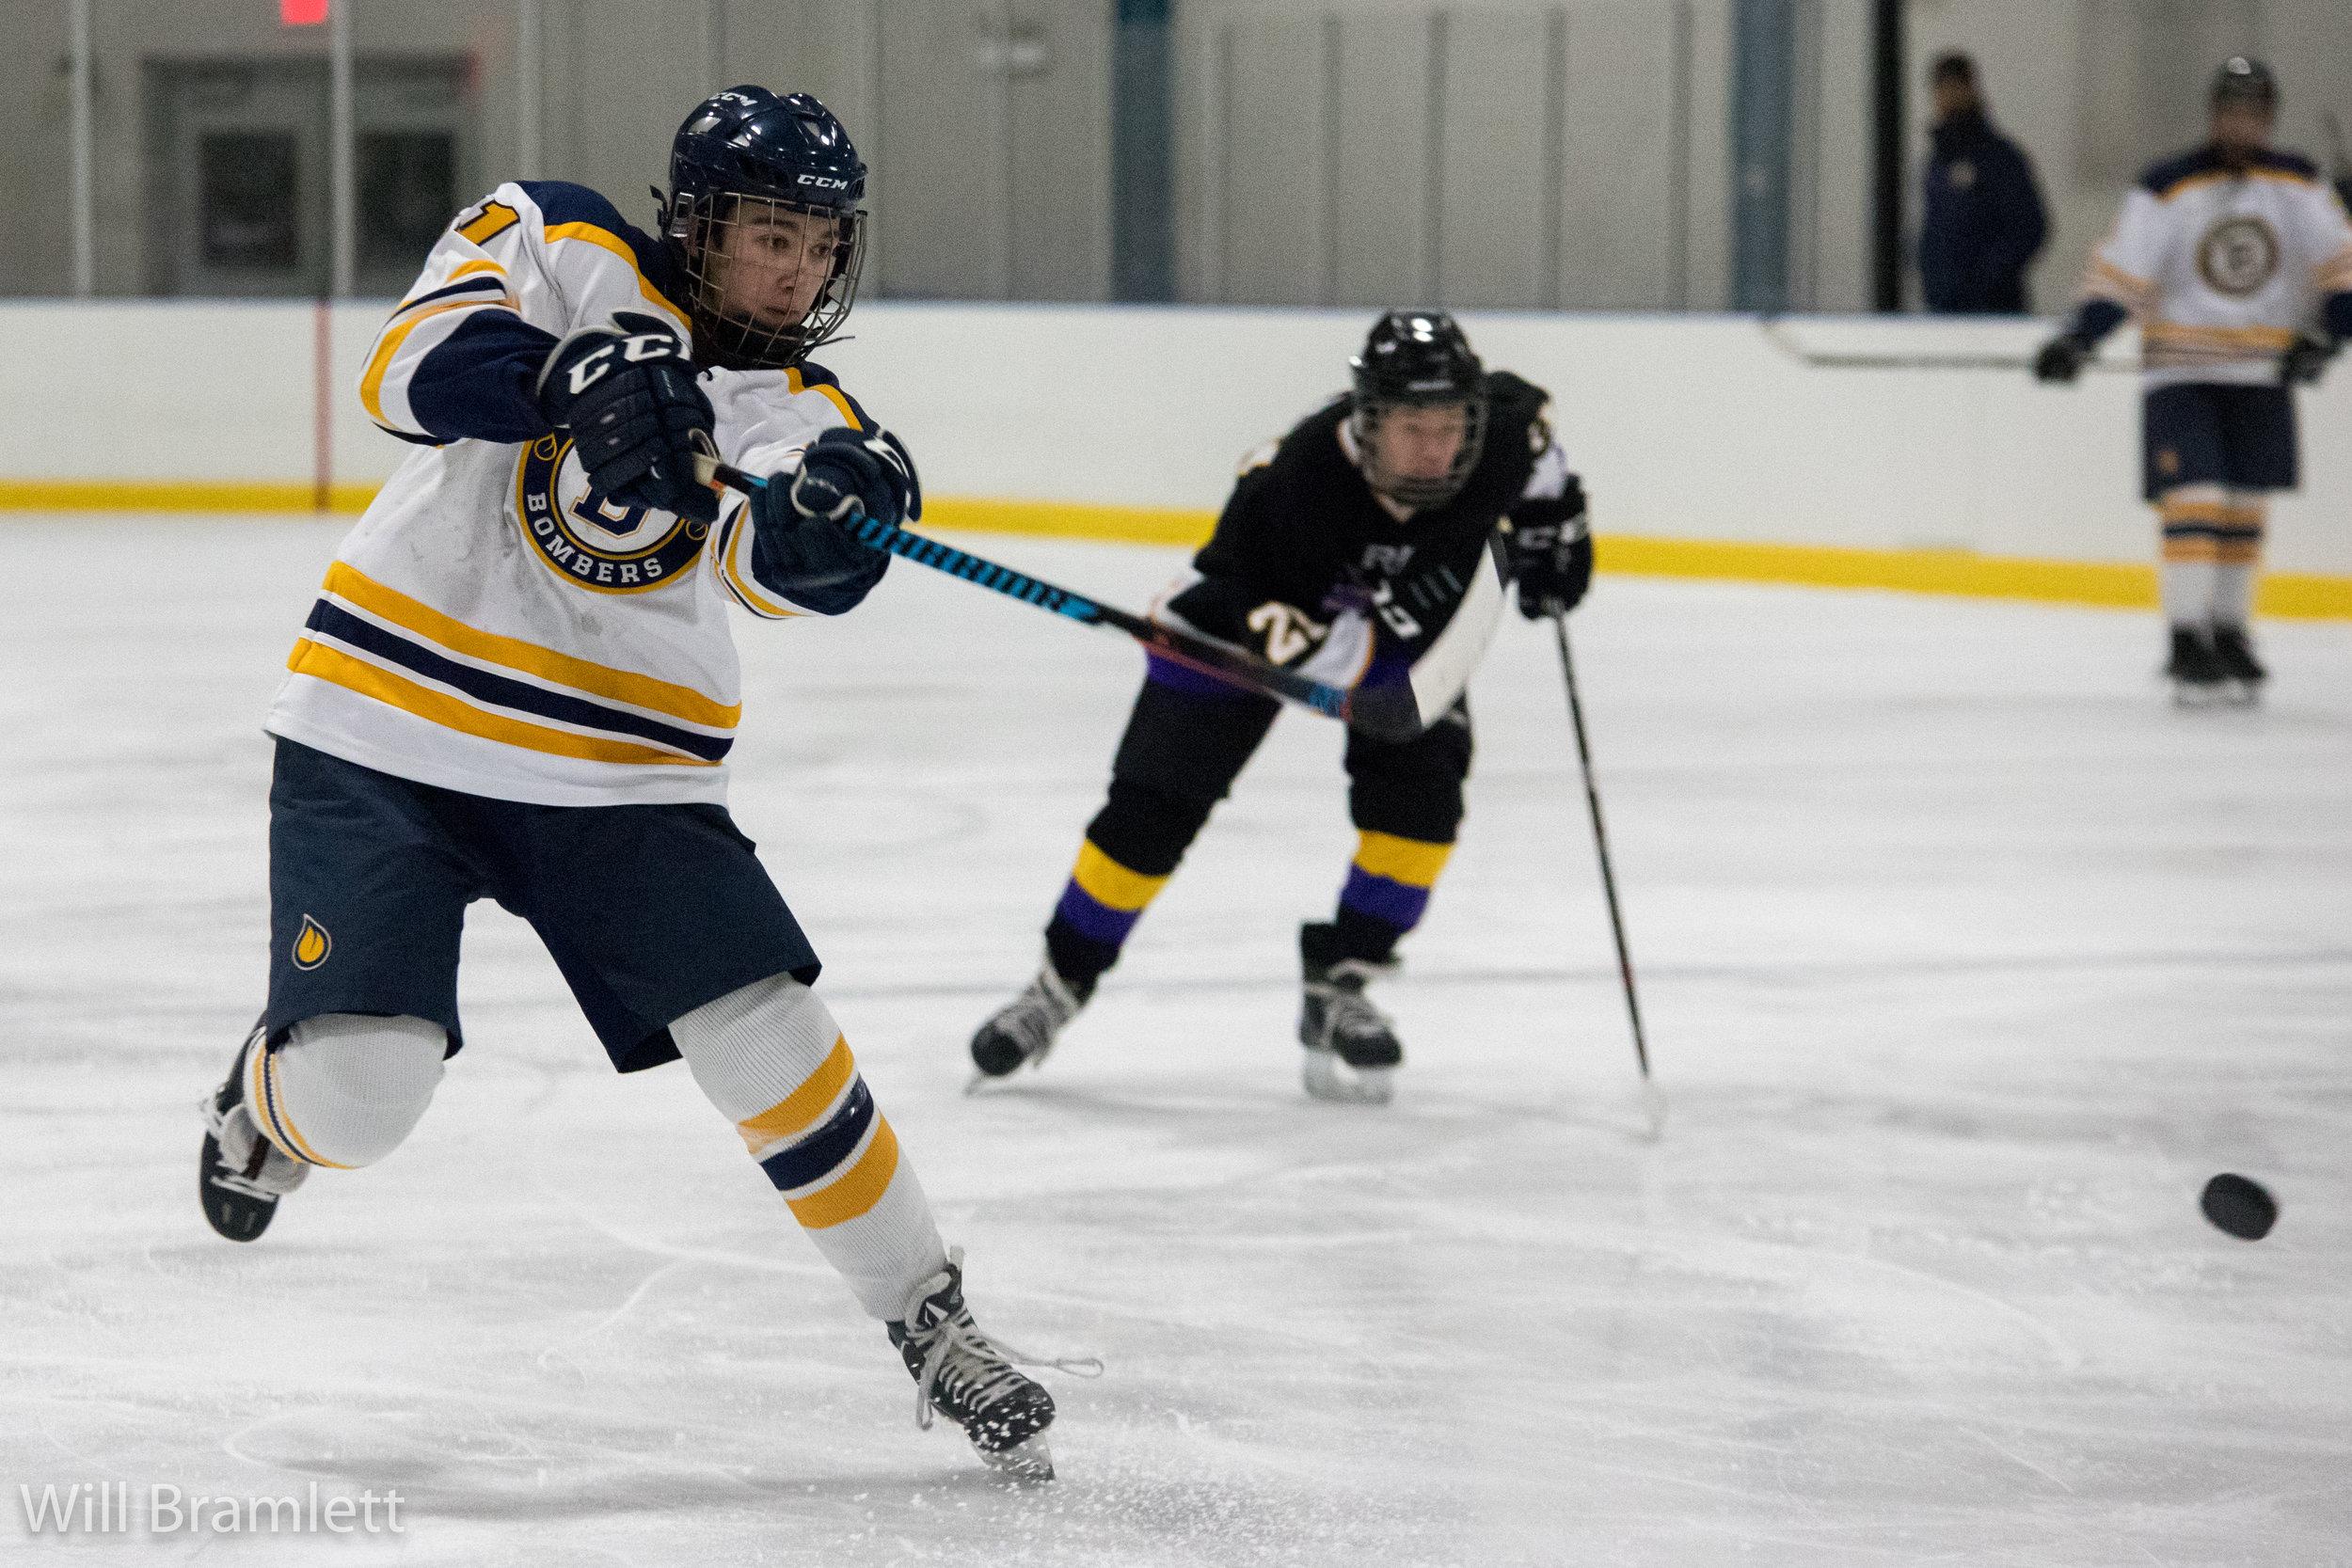 Ice Hockey Jbs Vs Eureka Work In The Morning